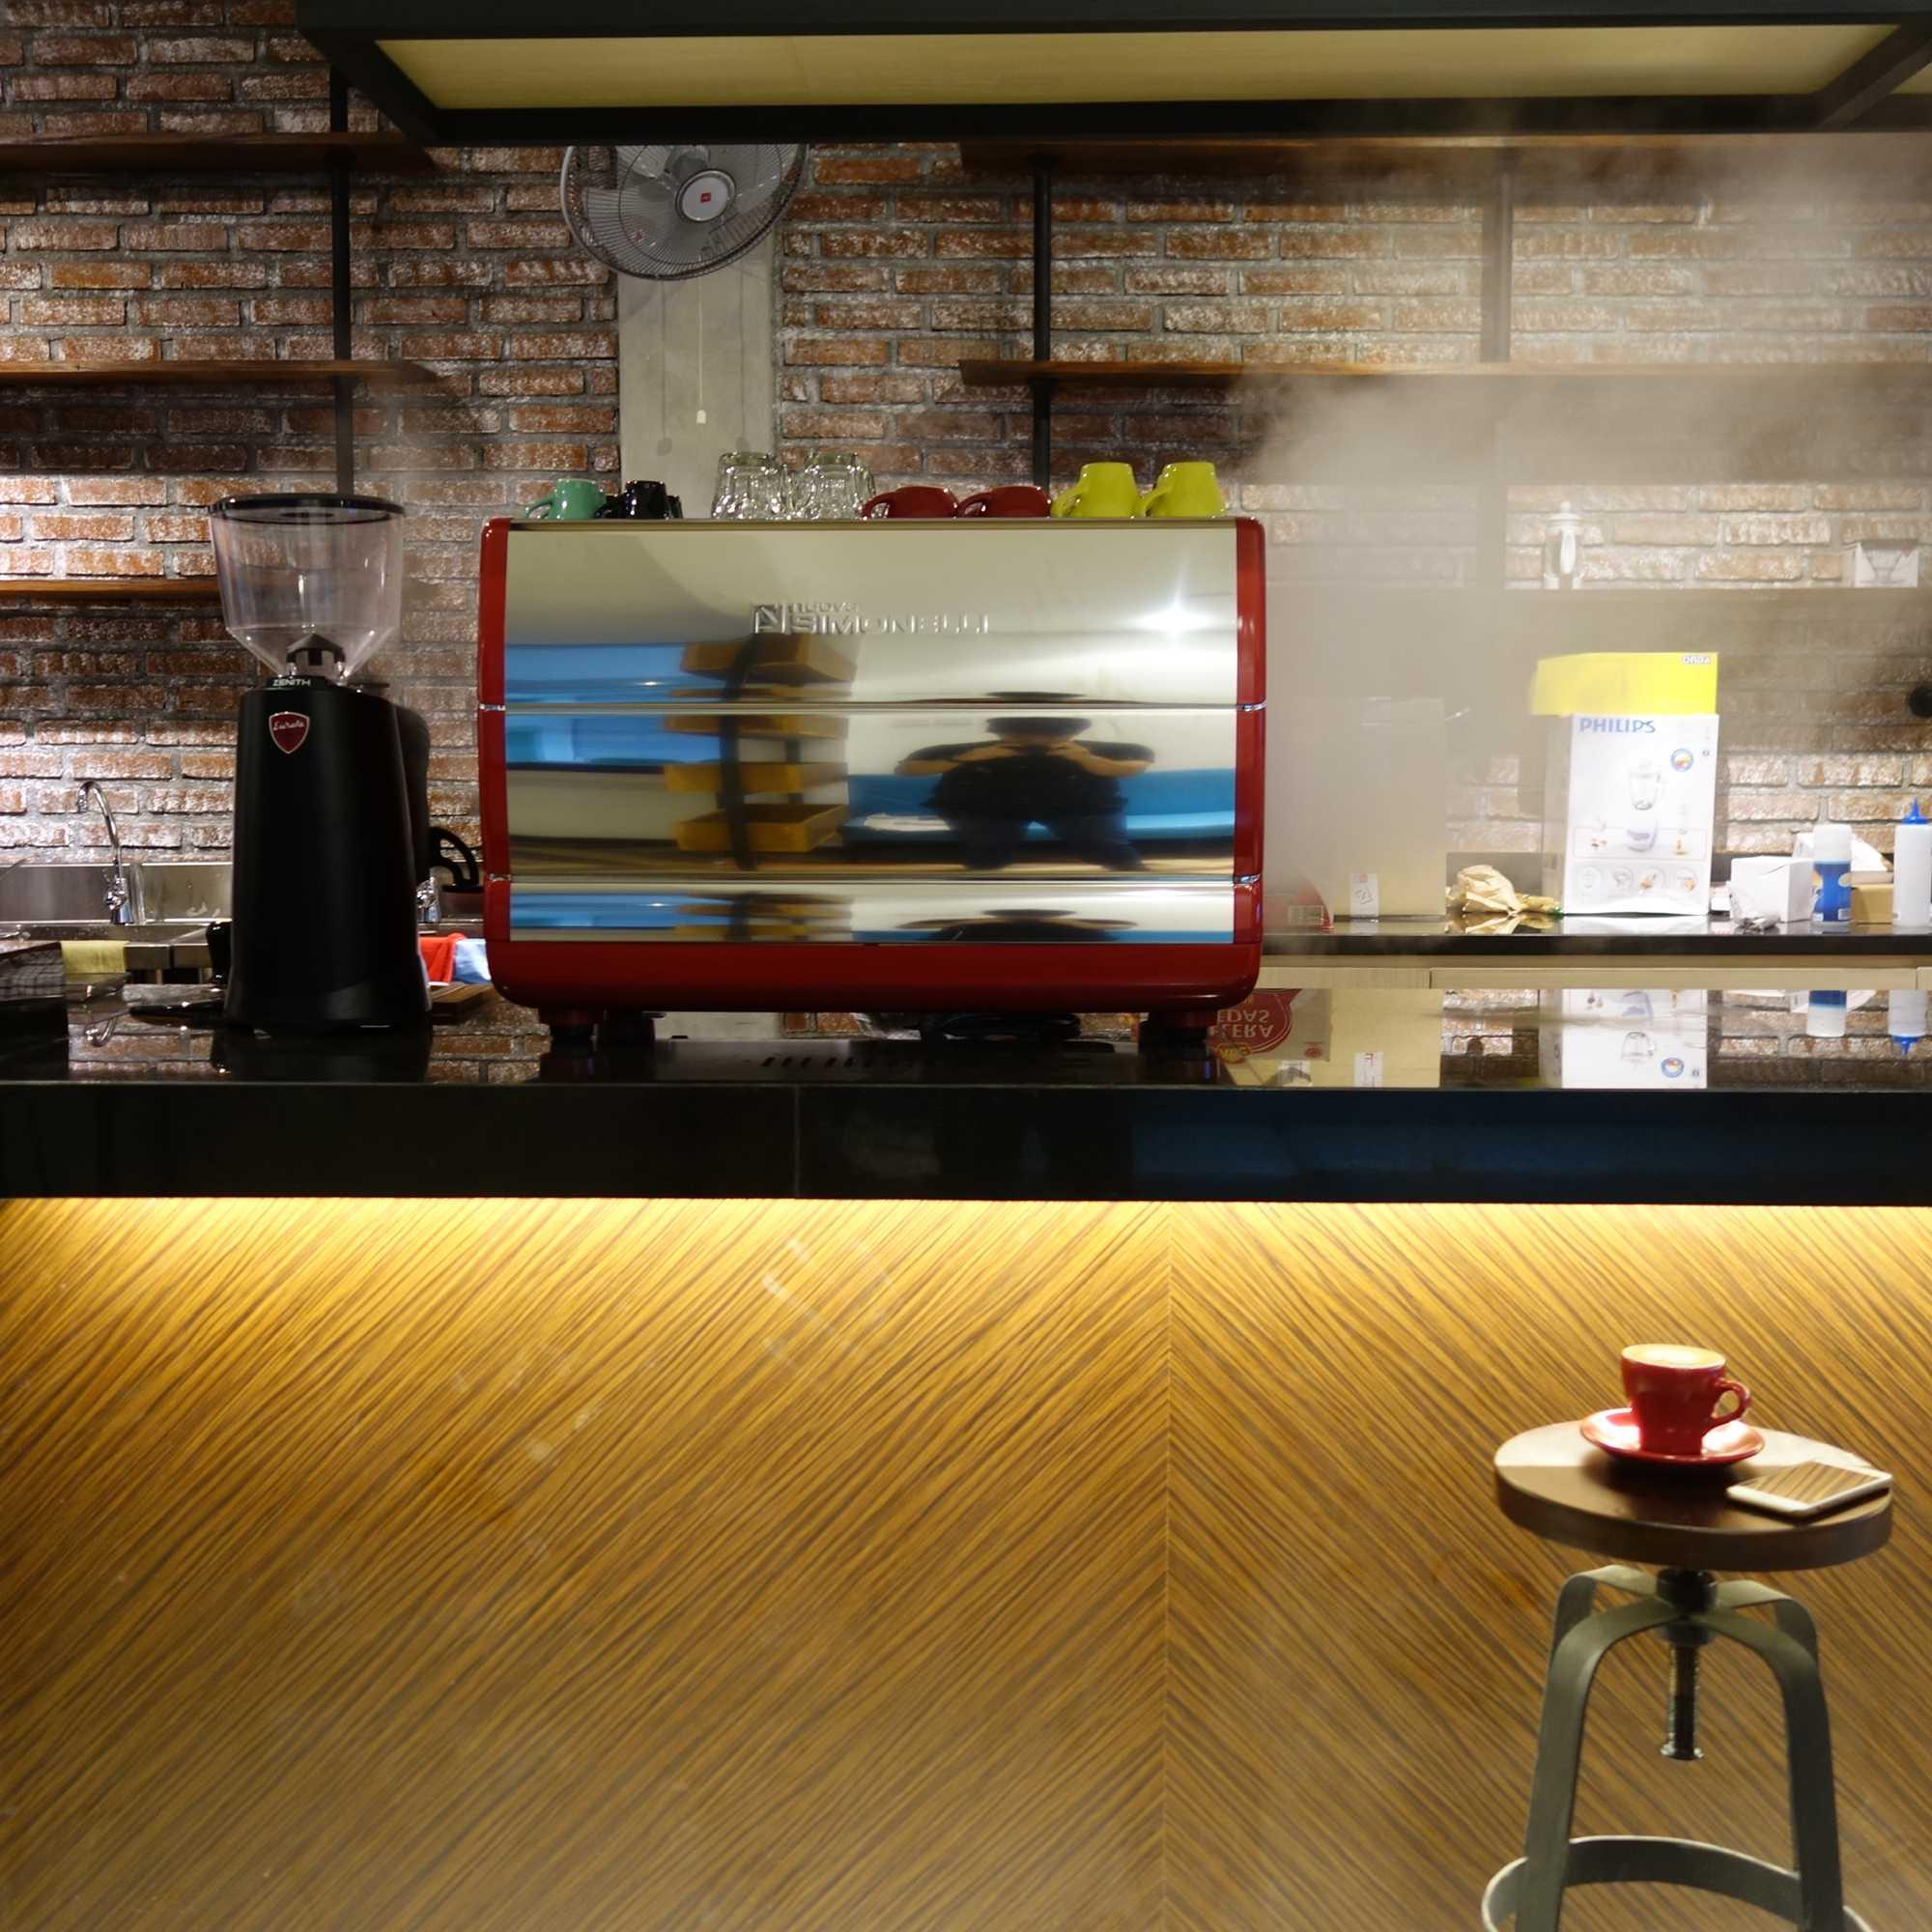 Aditya Wira Hardi Prague Coffee And Eatery Madiun, Kota Madiun, Jawa Timur, Indonesia Madiun, Kota Madiun, Jawa Timur, Indonesia Aditya-Wira-Hardi-Prague-Coffee-And-Eatery  65906